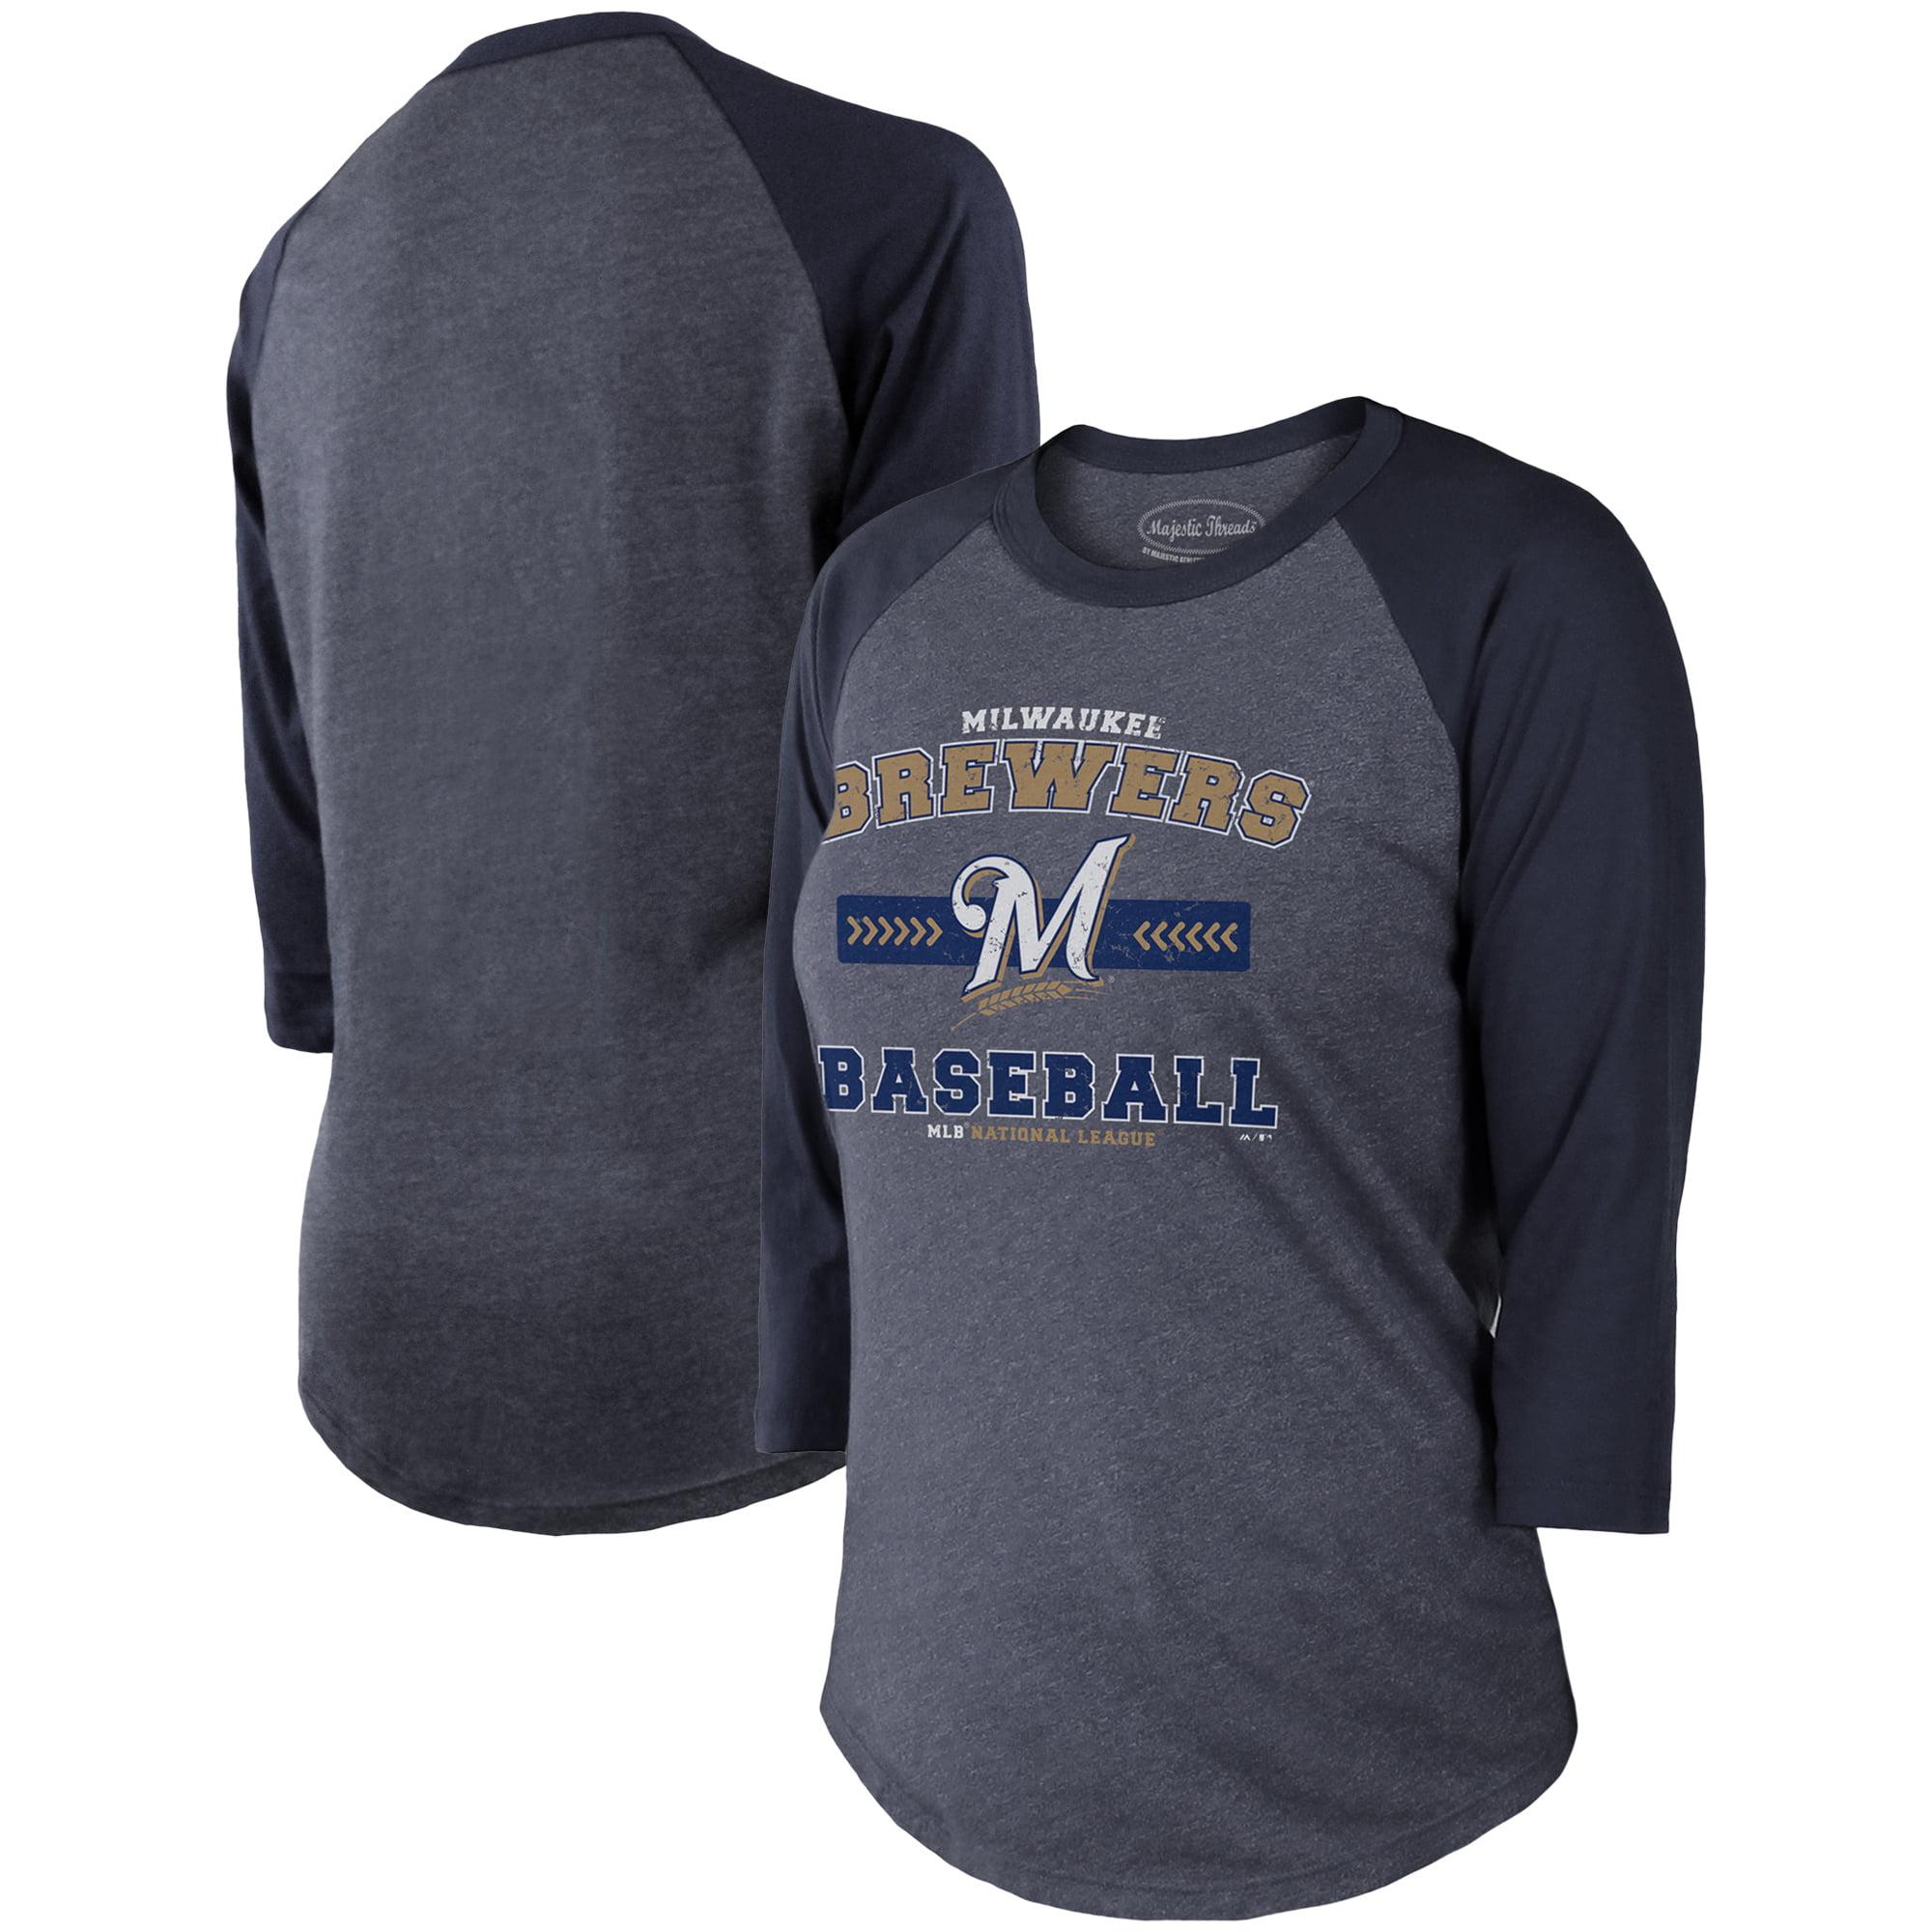 Milwaukee Brewers Majestic Threads Women's Tri-Blend 3/4-Sleeve Raglan T-Shirt - Navy